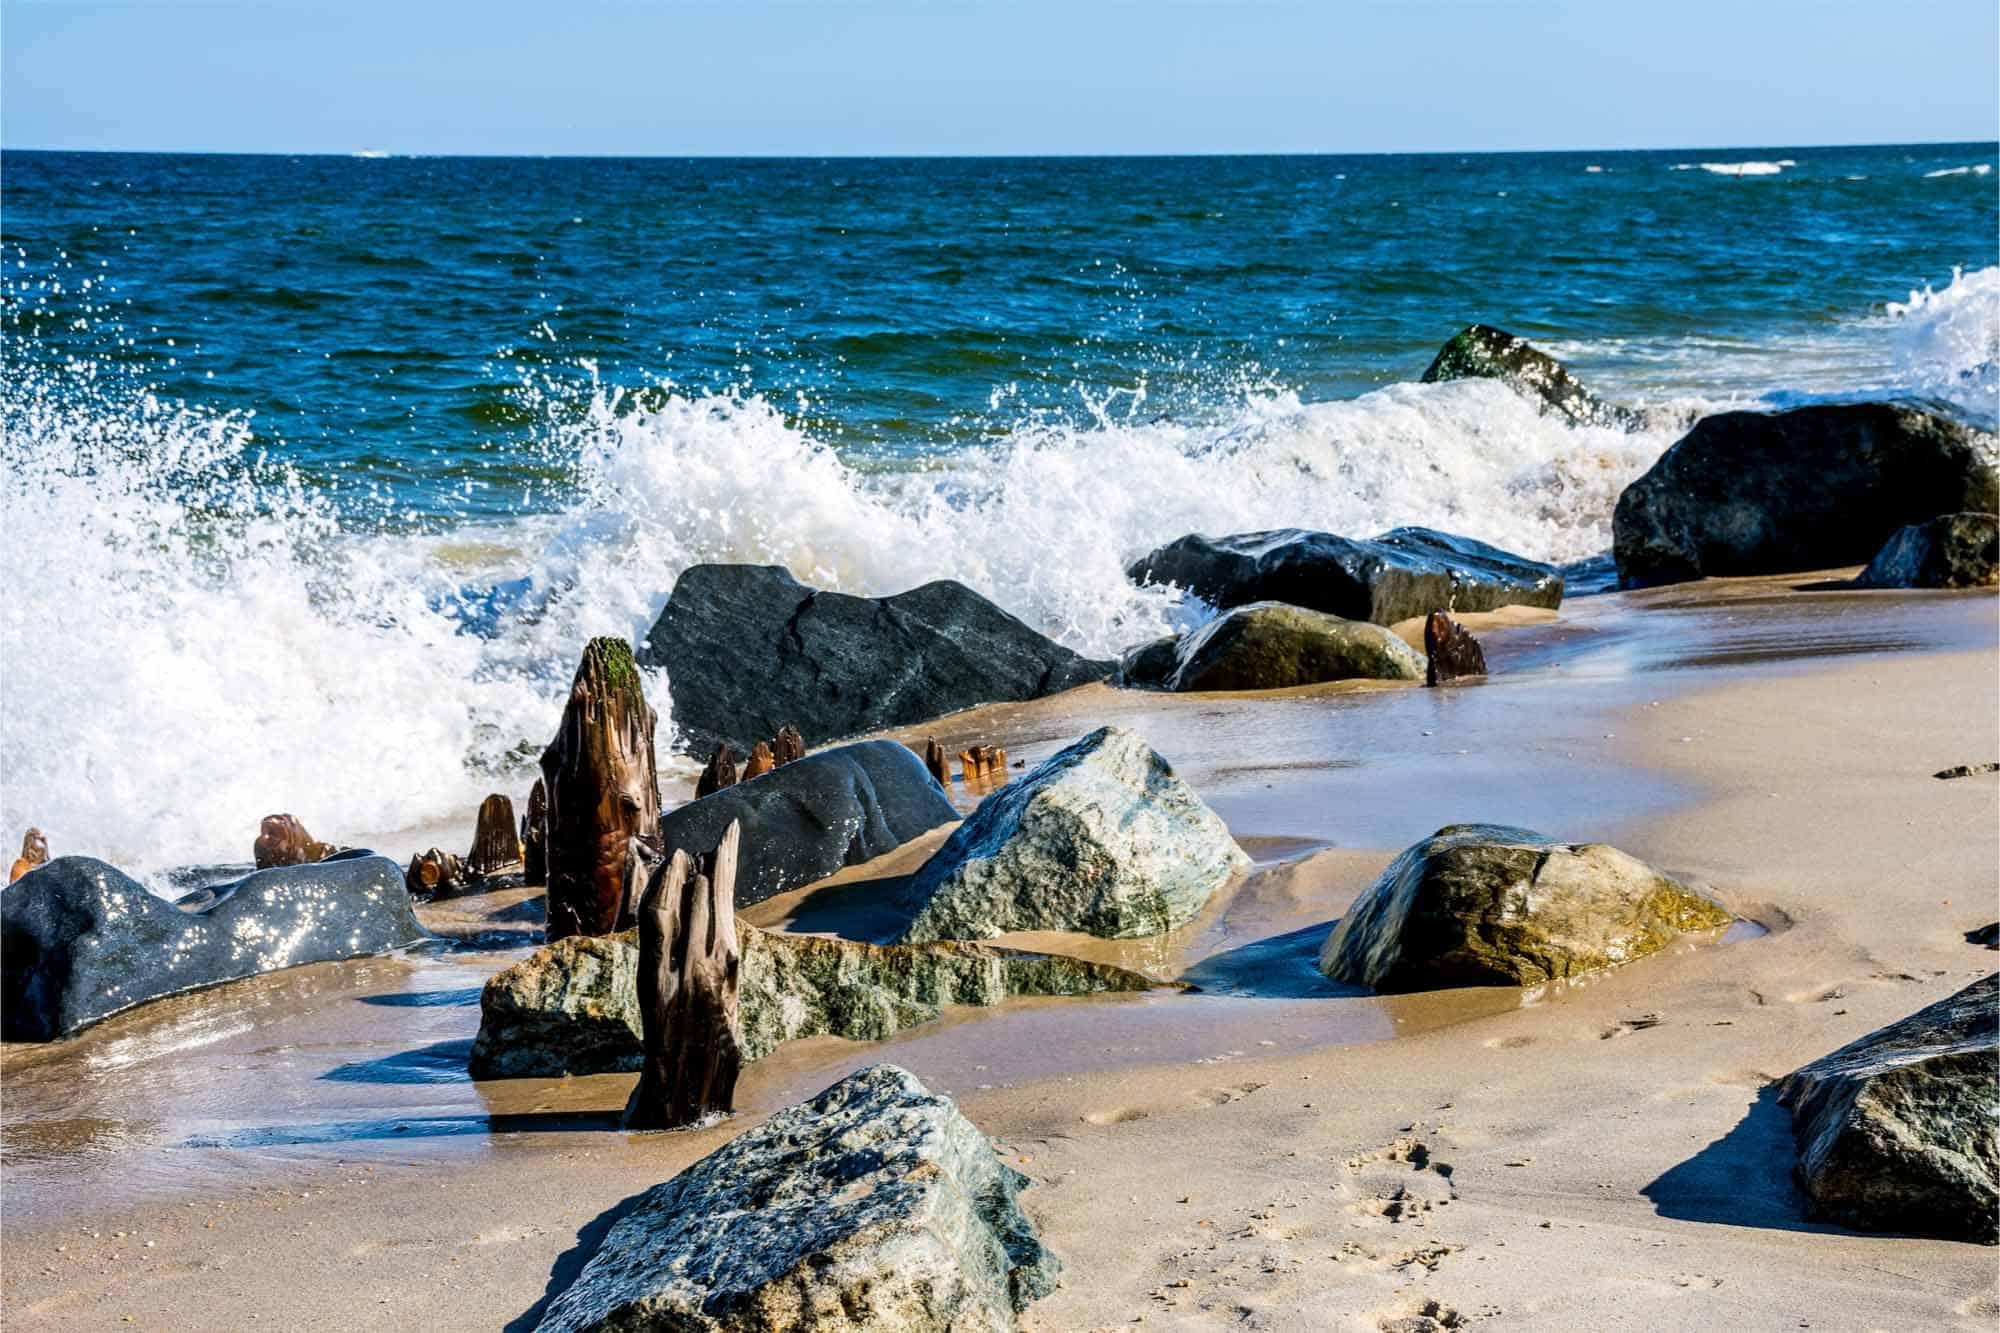 Waves crashing on beach with rocks